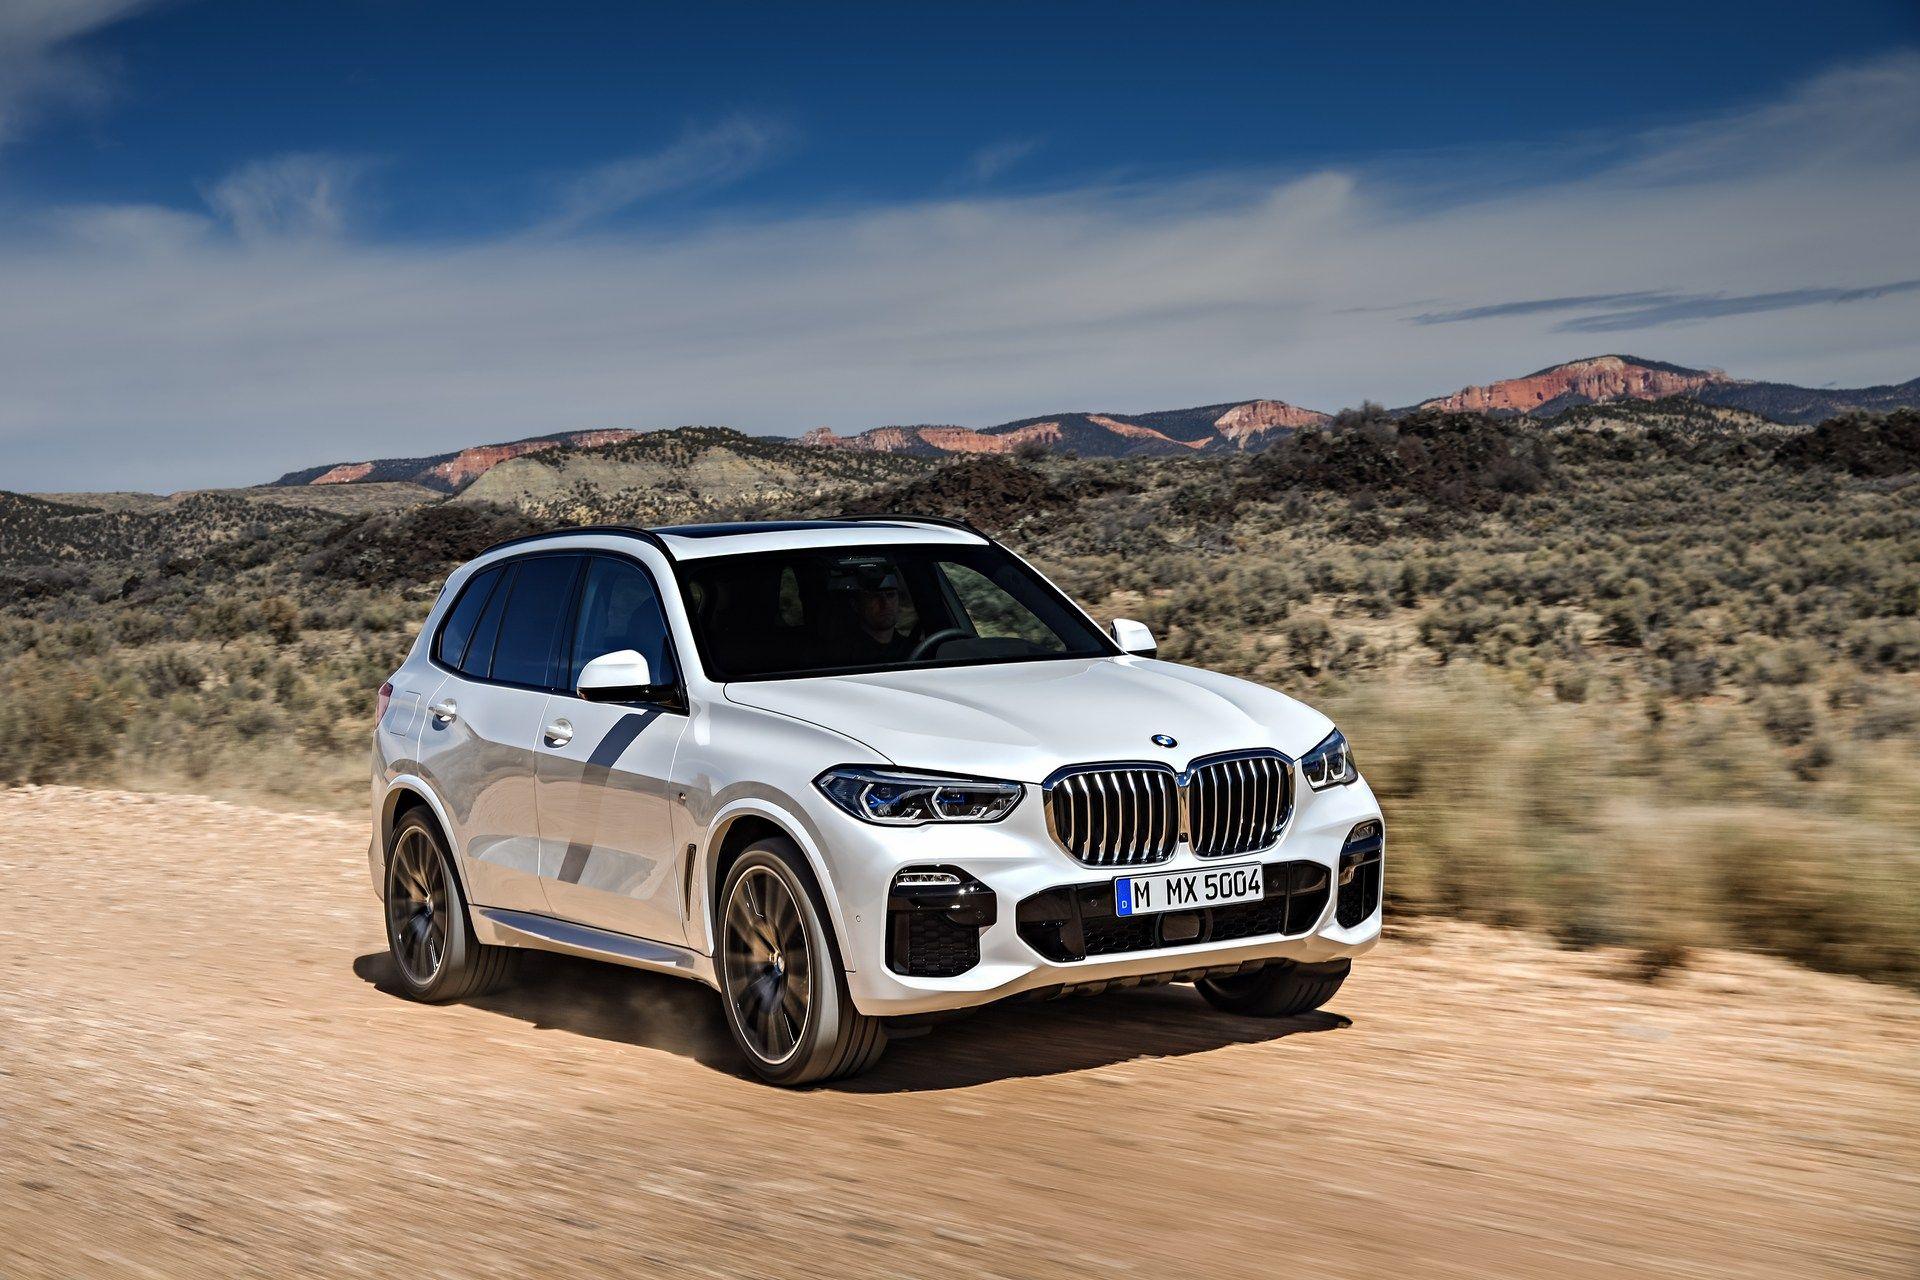 BMW-X5-13-1.jpg